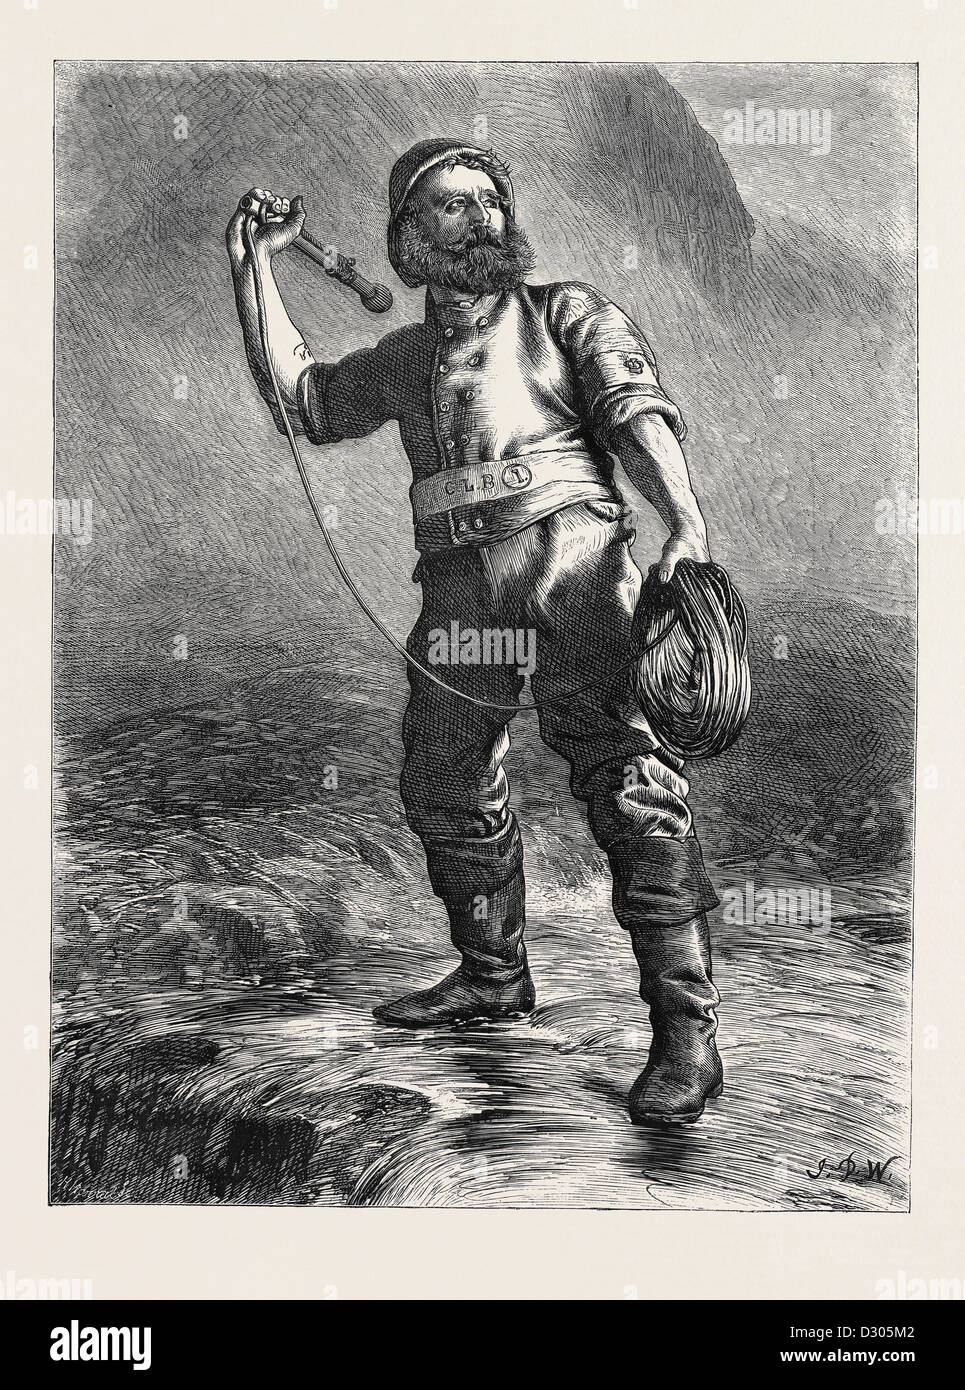 THE LIFE BRIGADE MAN, 1870 - Stock Image